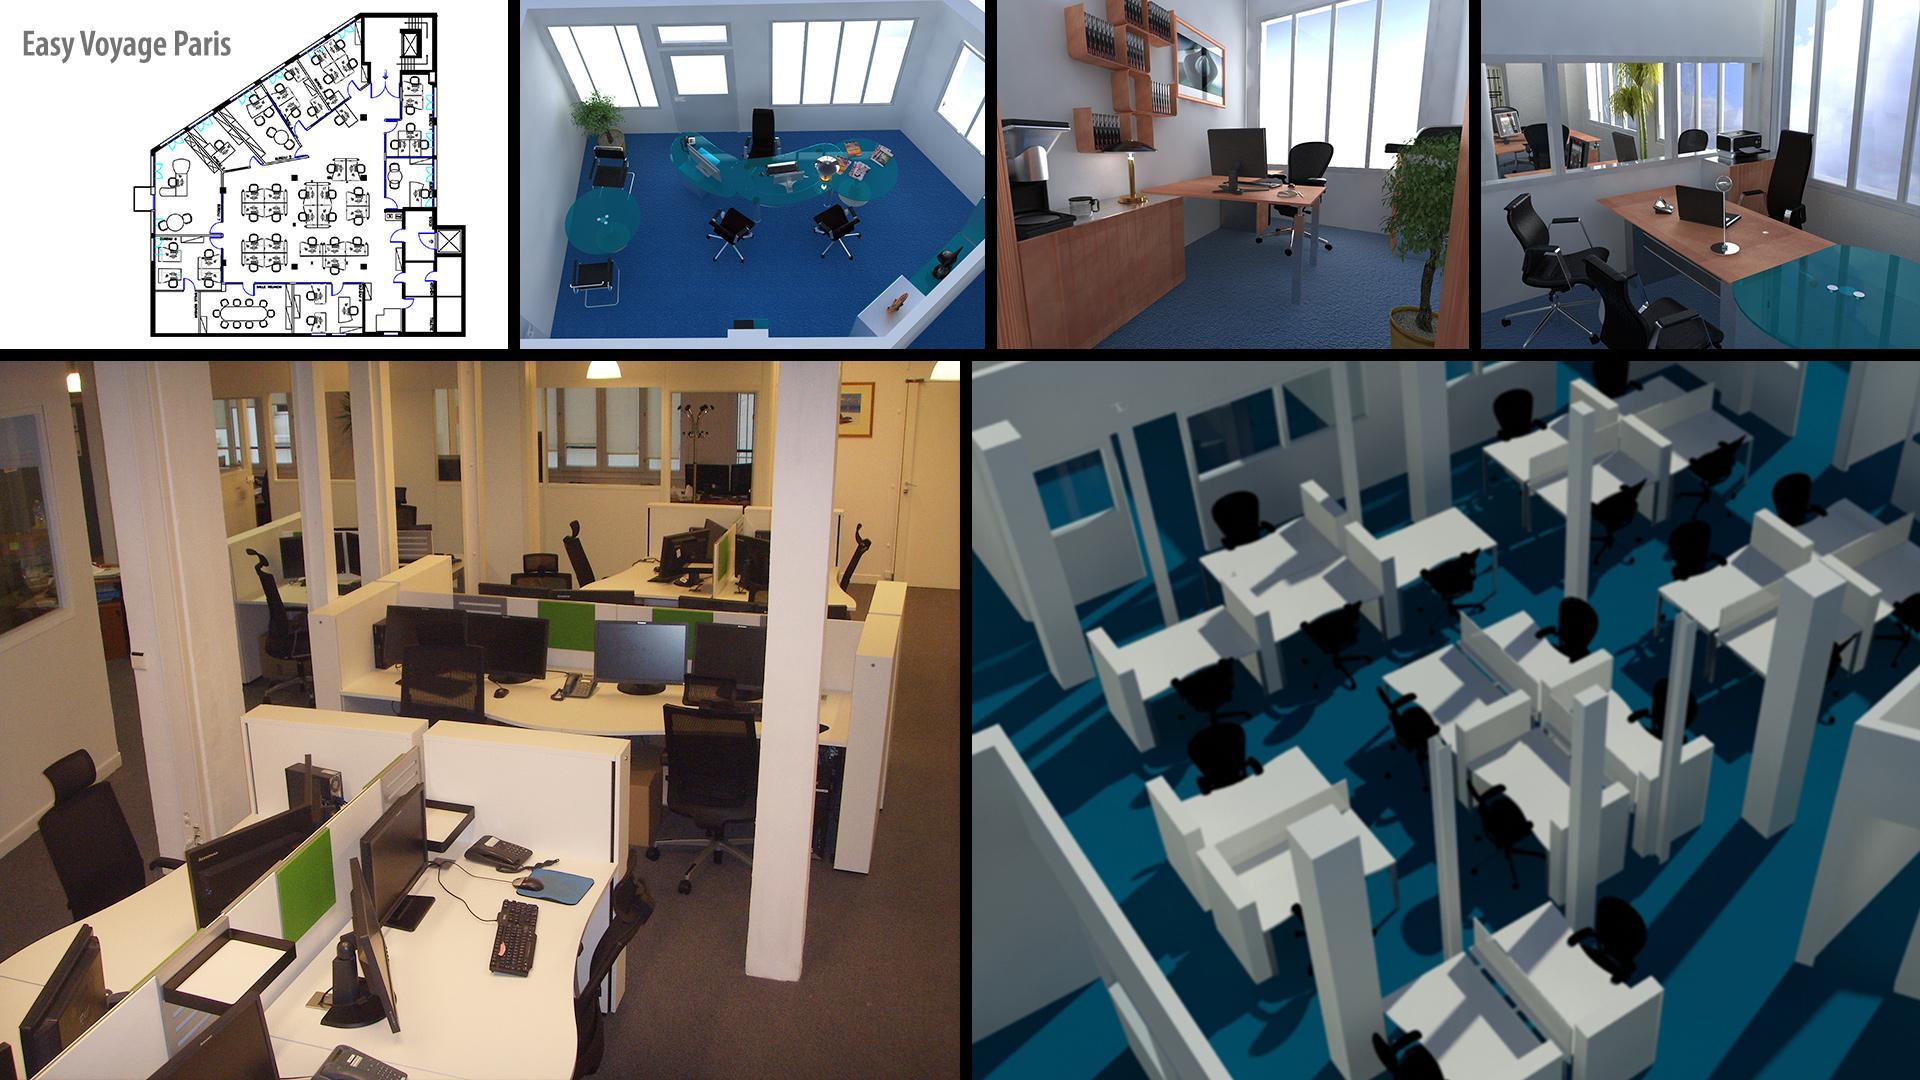 Interior Design, offices Easy Voyage, Paris